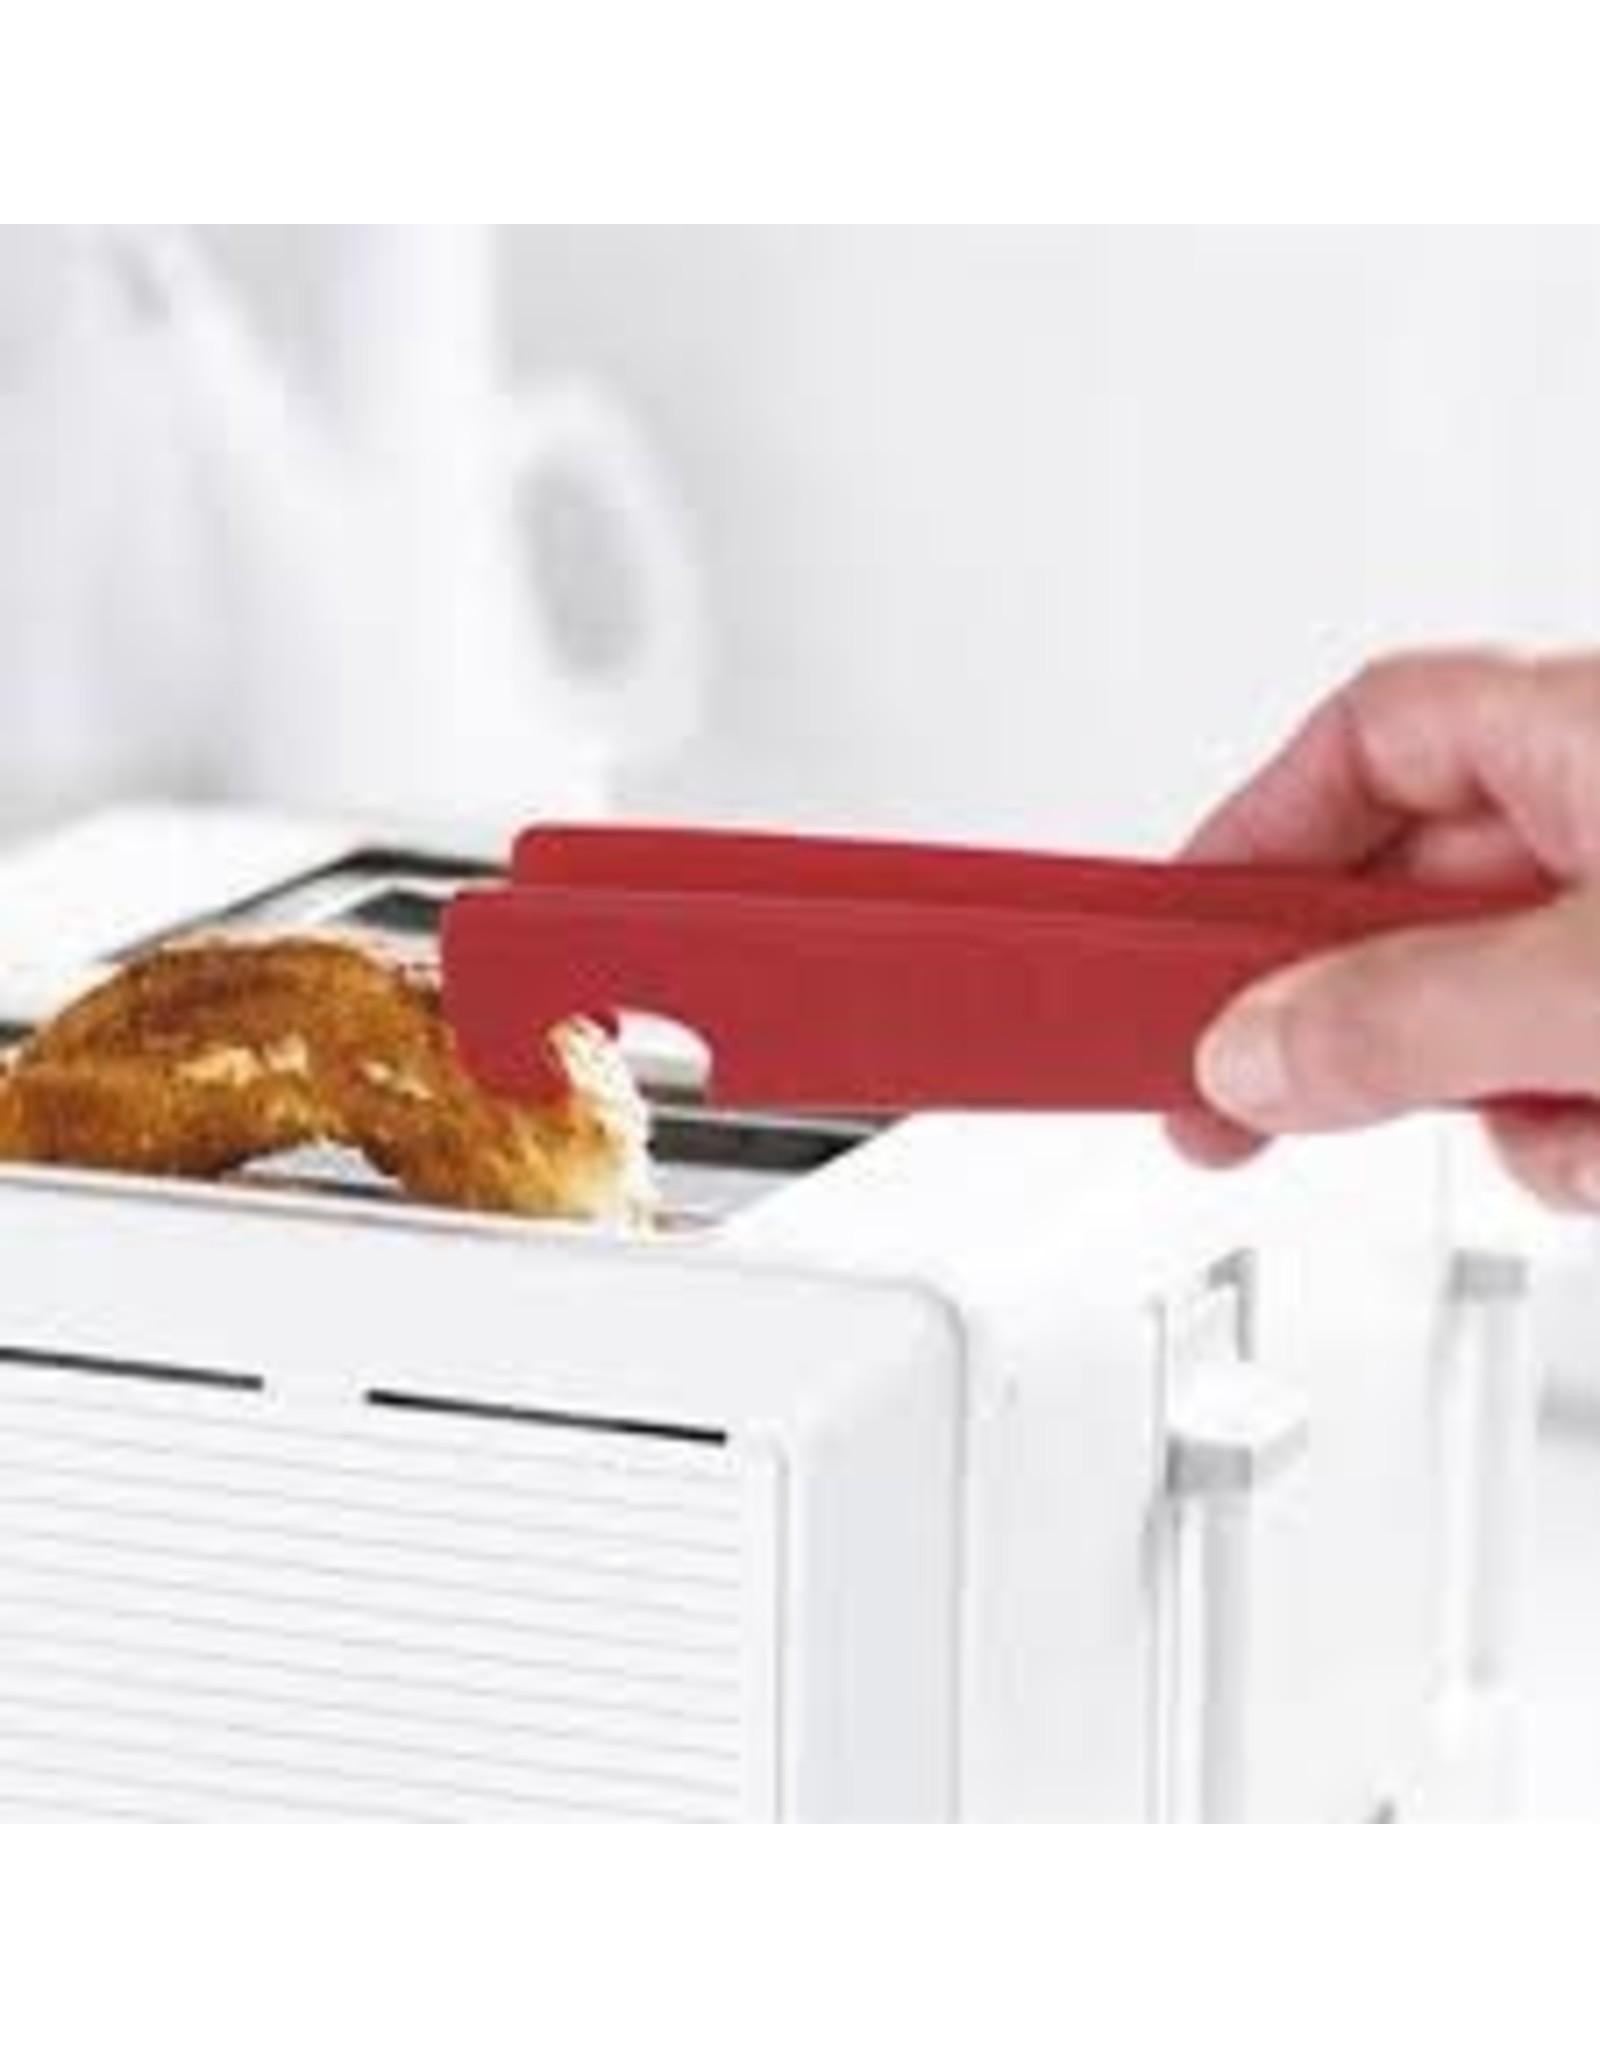 TRUD Toaster Tongs